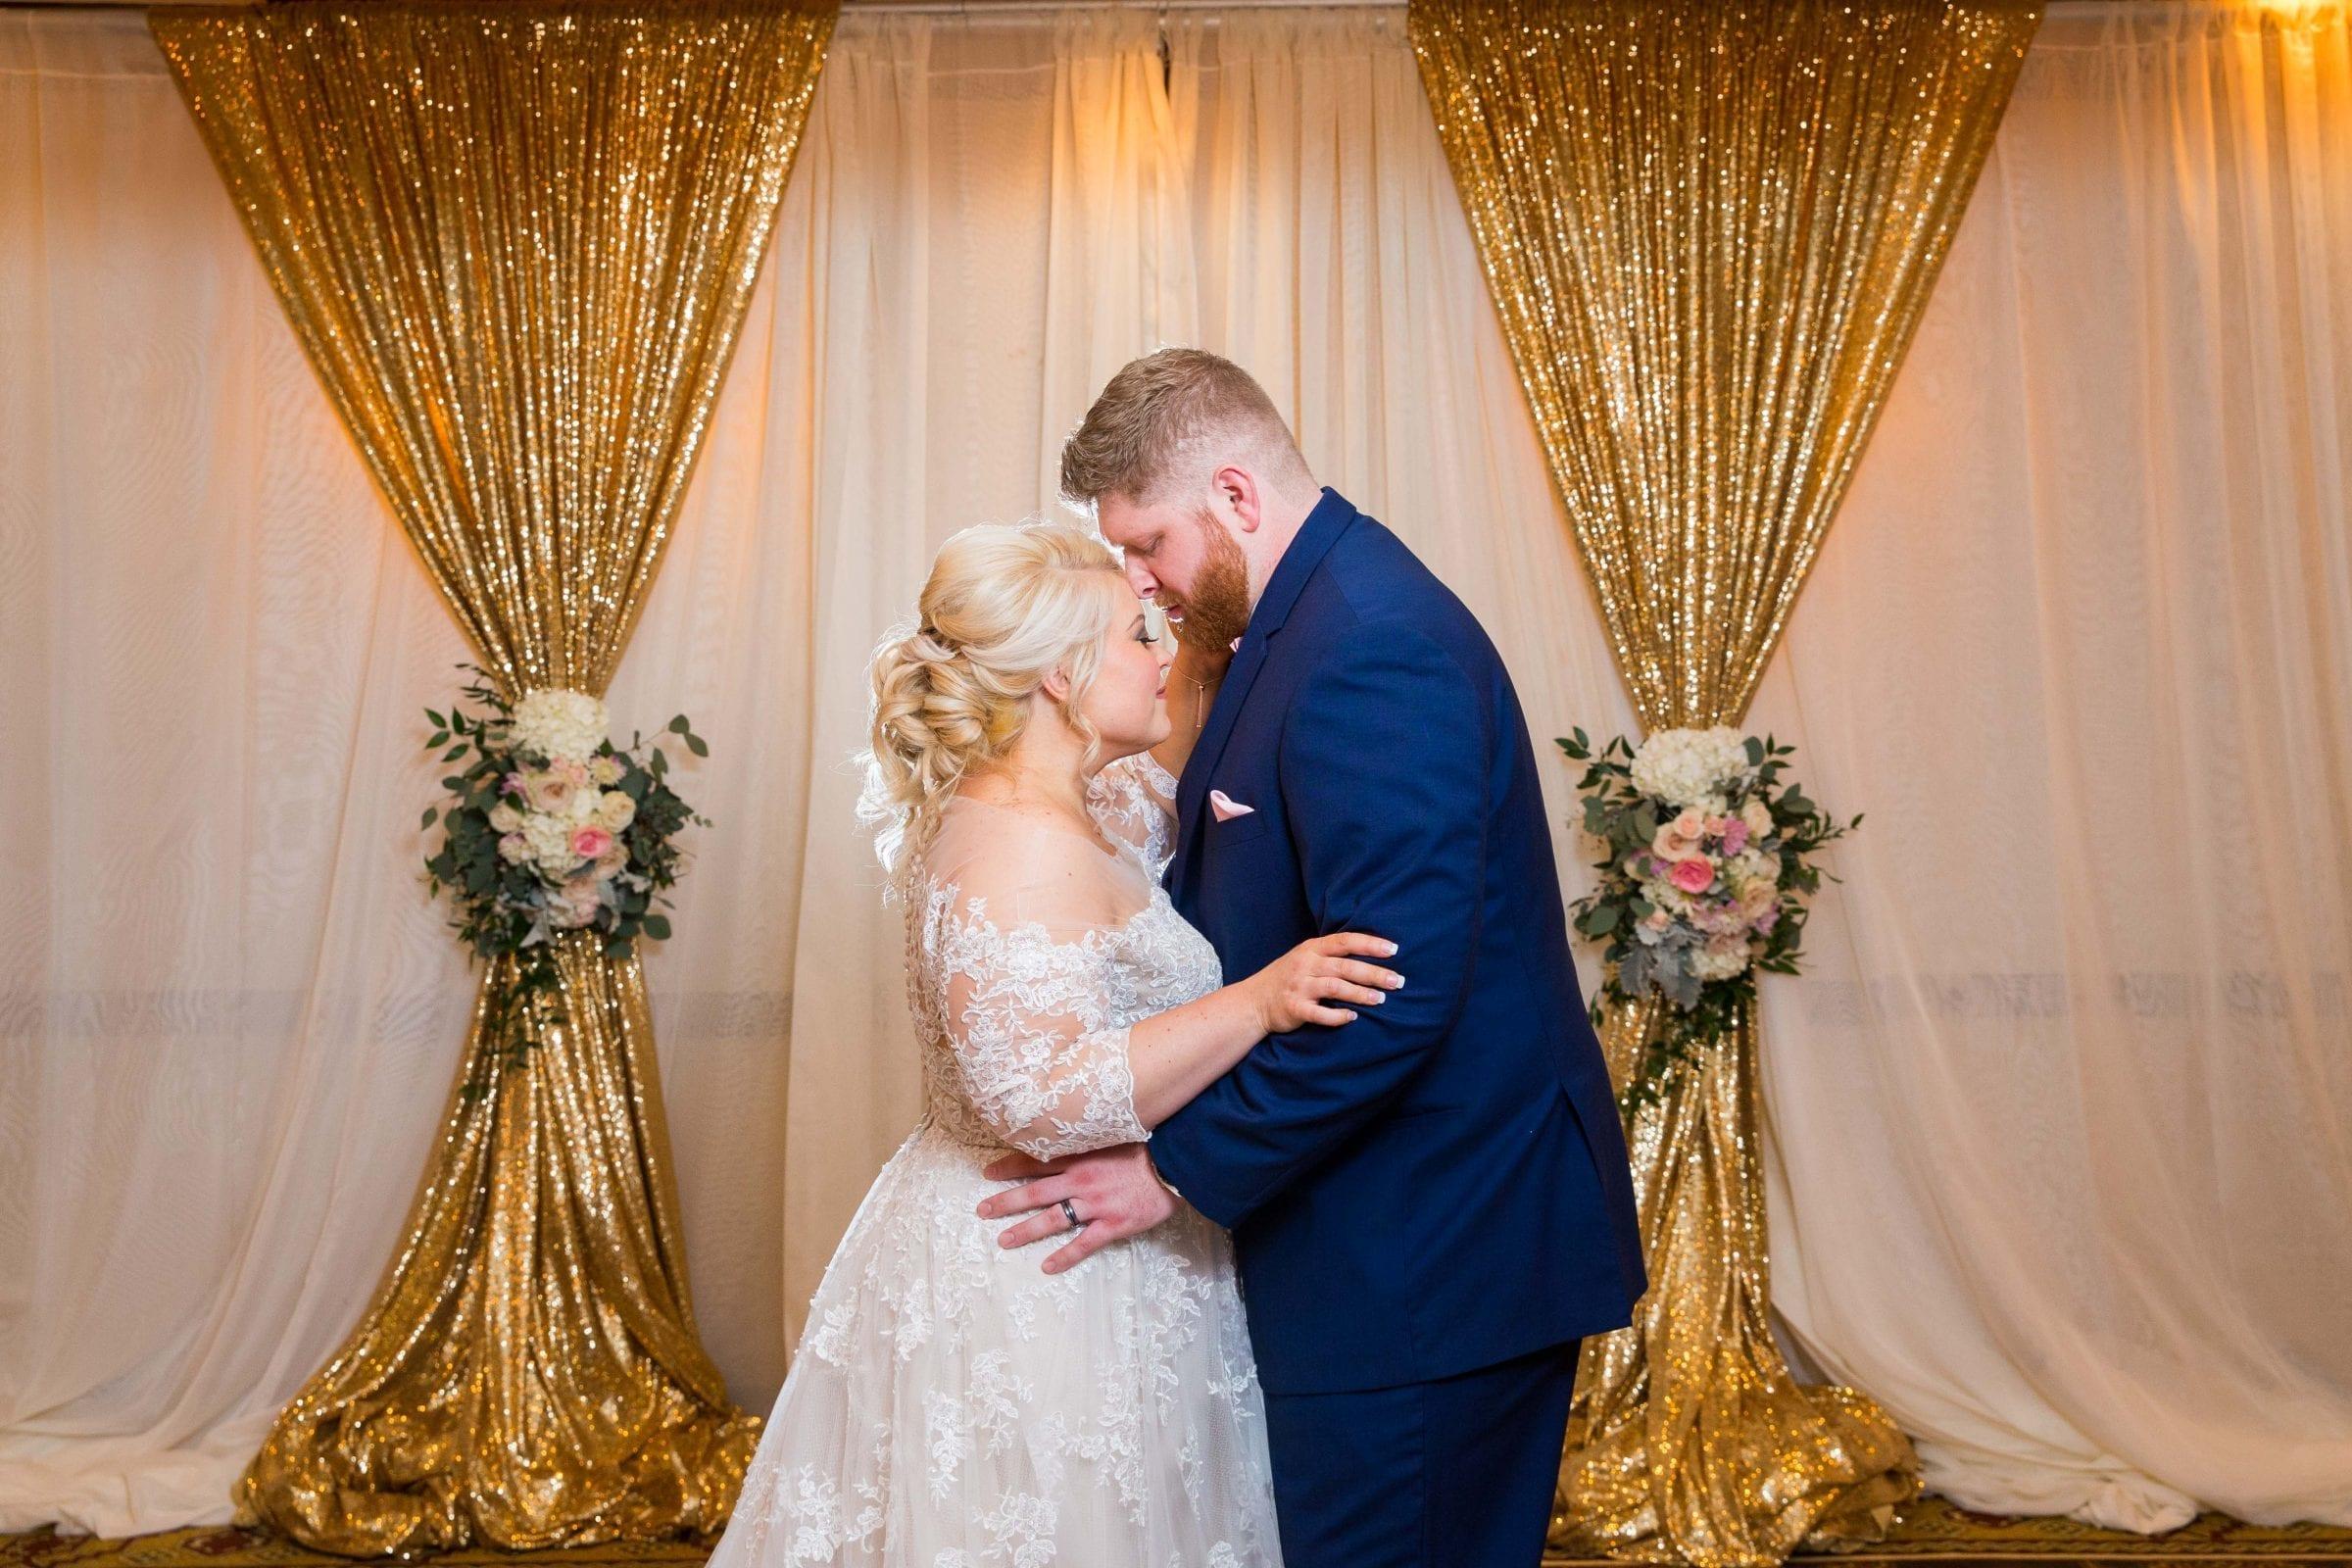 Crawford wedding Omni Del Mansion riverwalk kiss in room